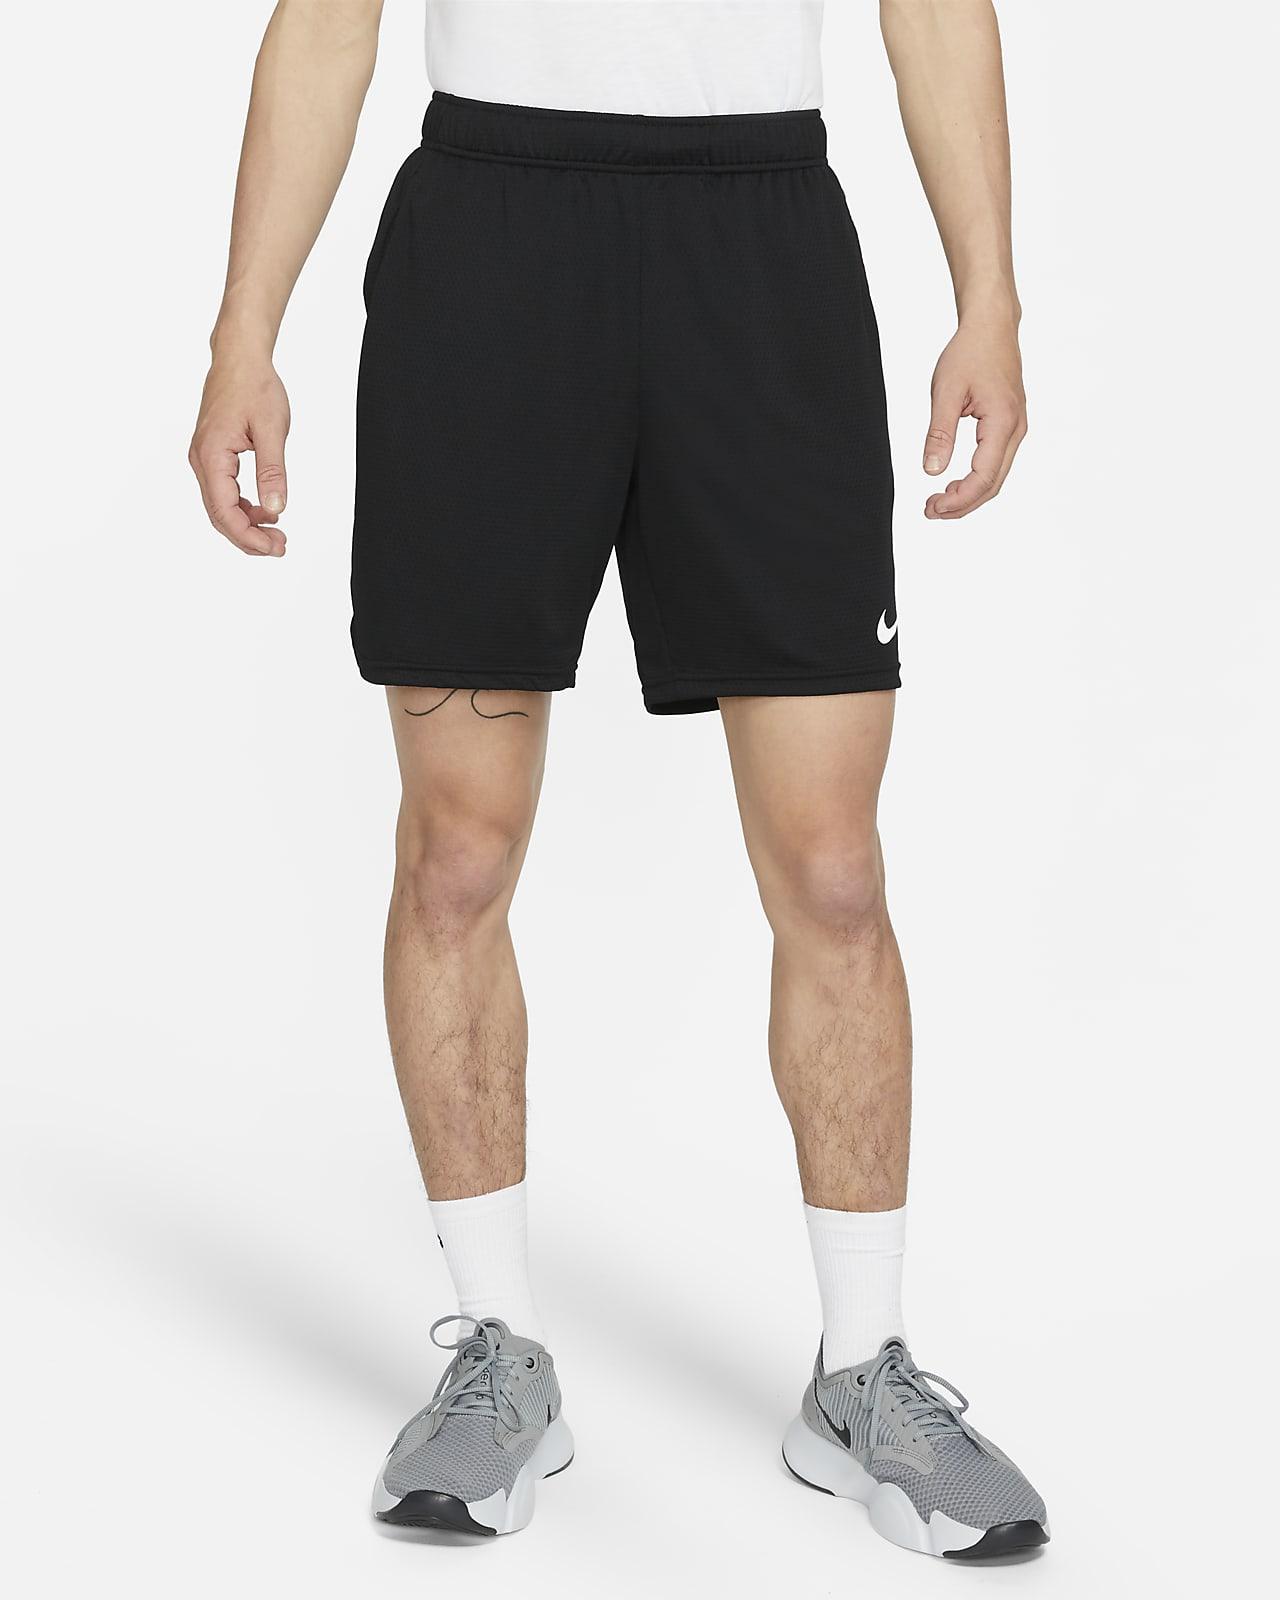 Nike Men's Mesh Training Shorts. Nike SG